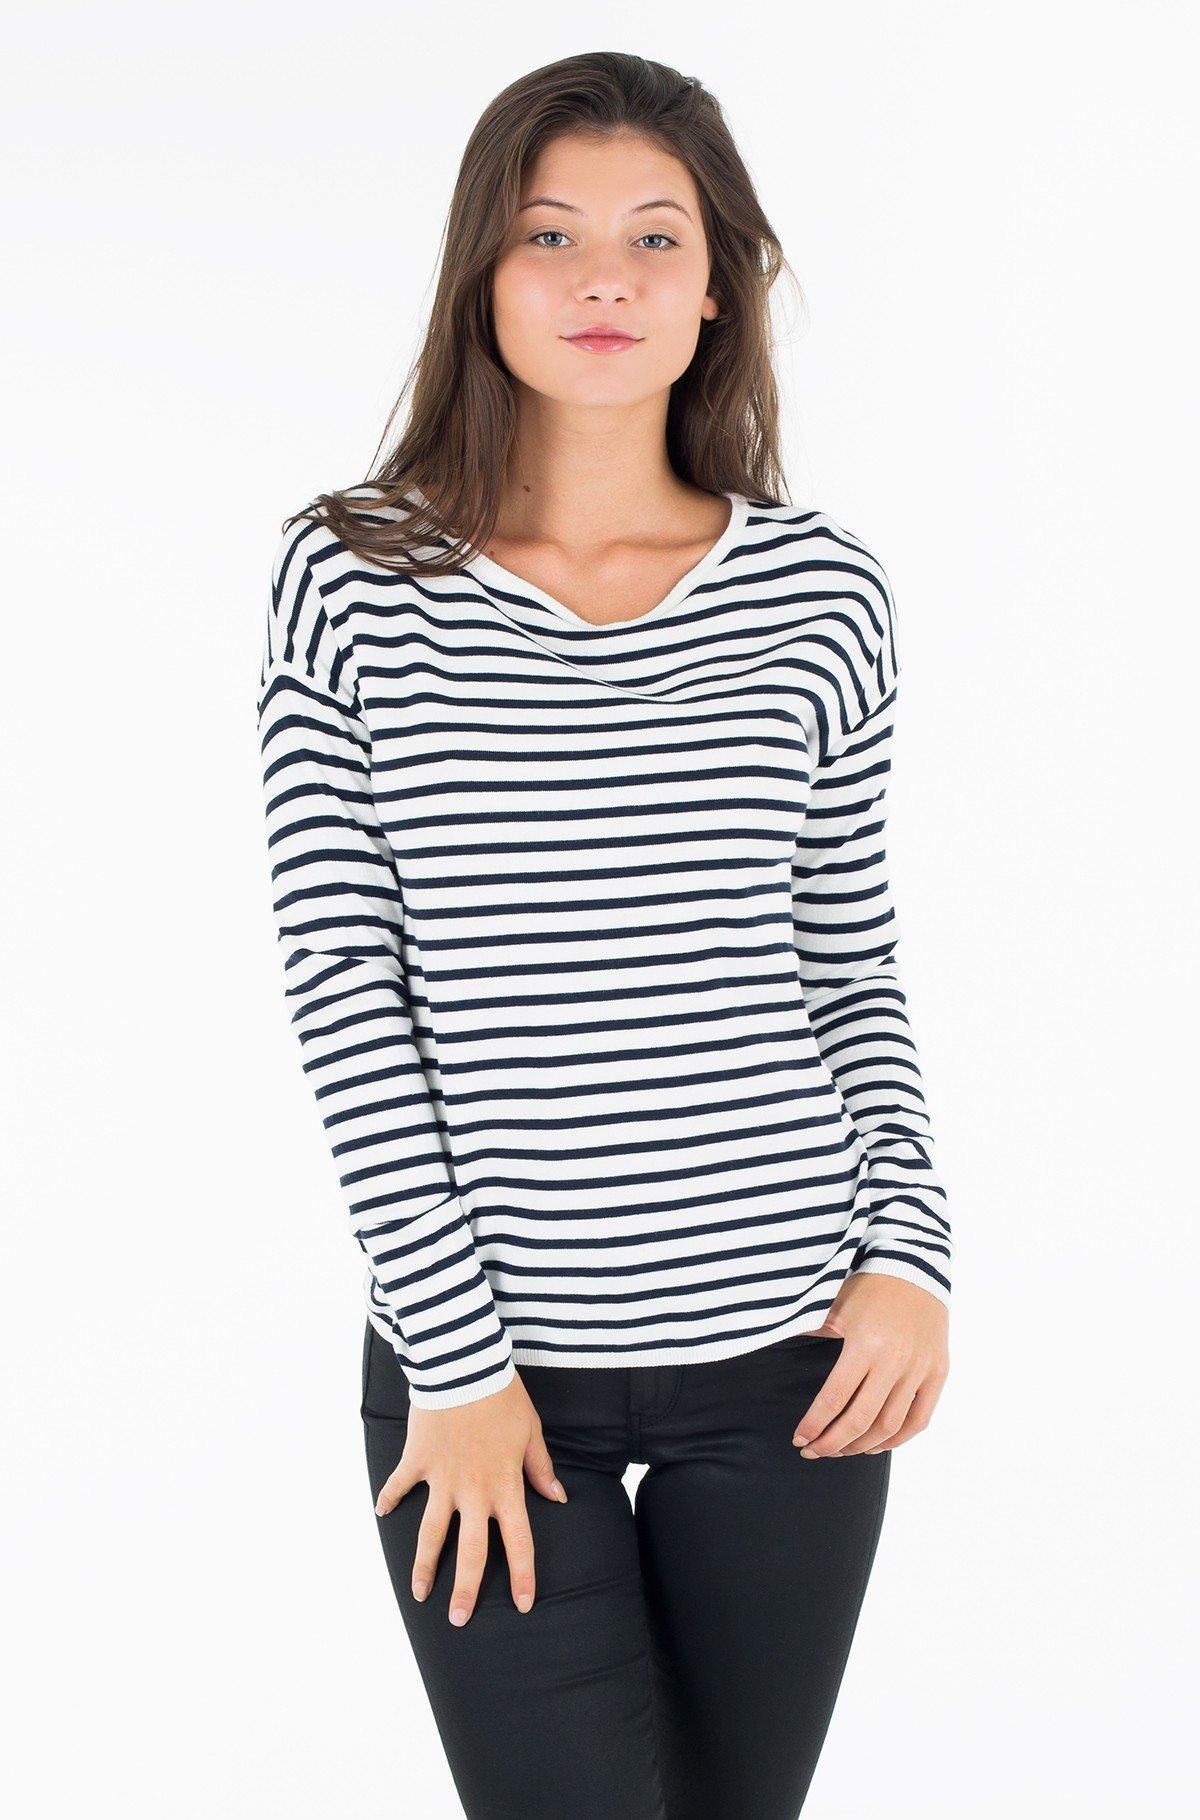 Sweater 3022784.09.70-full-1